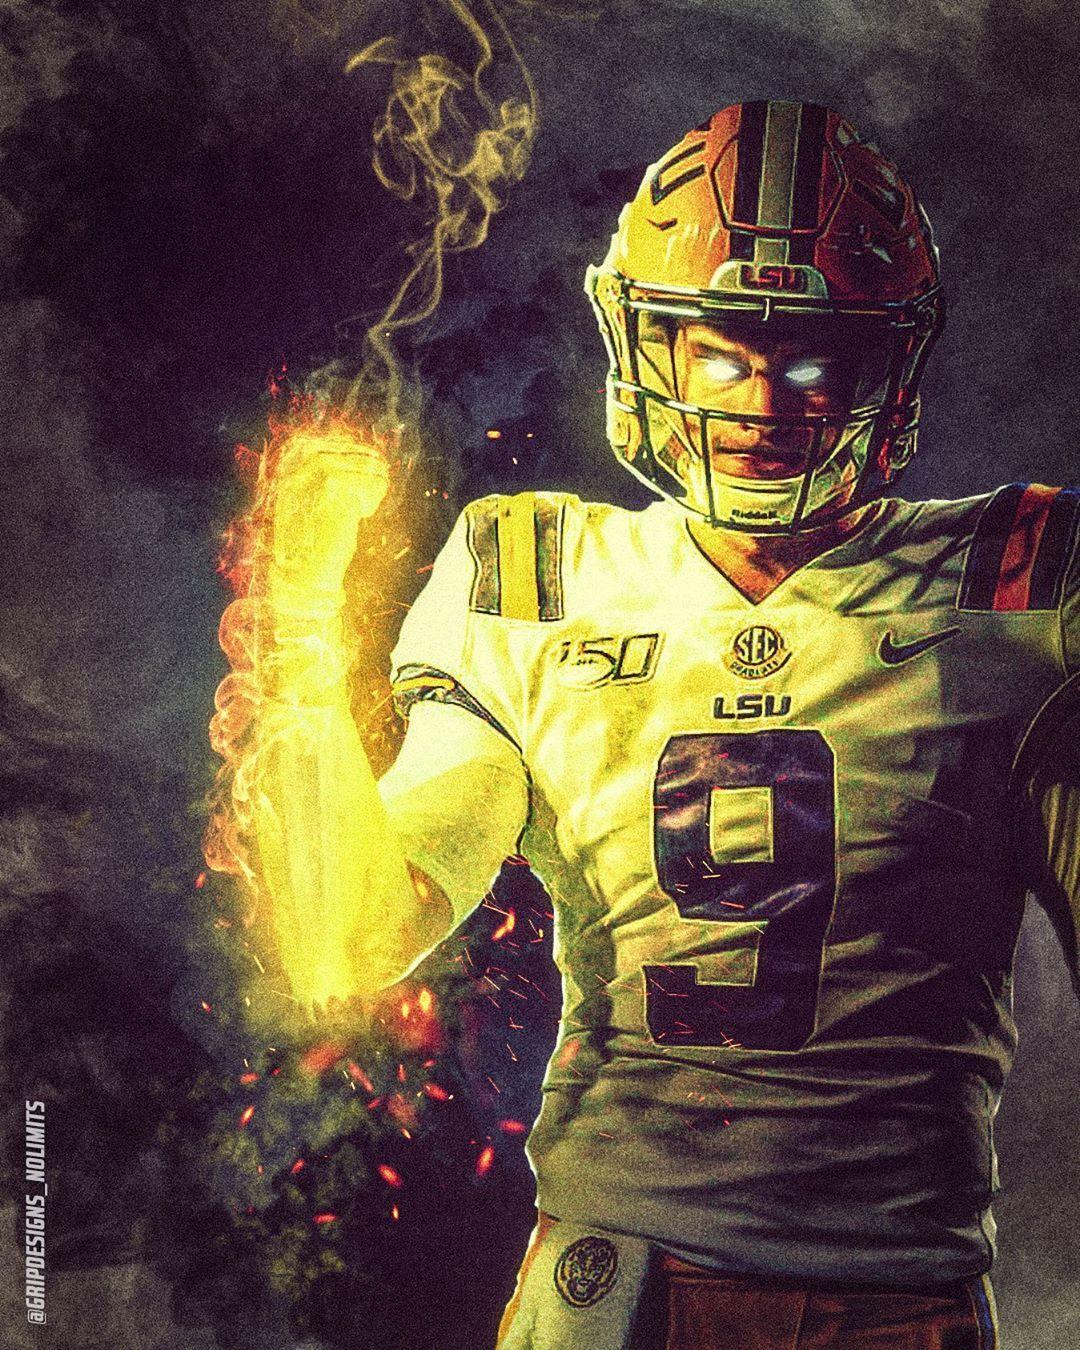 Todd Miller On Instagram Joe Burrow10 Lookin To Light It Up Again This New Year Happy 2020 Everybody Burreaux In 2020 Lsu Tigers Football Lsu Football Lsu Babies